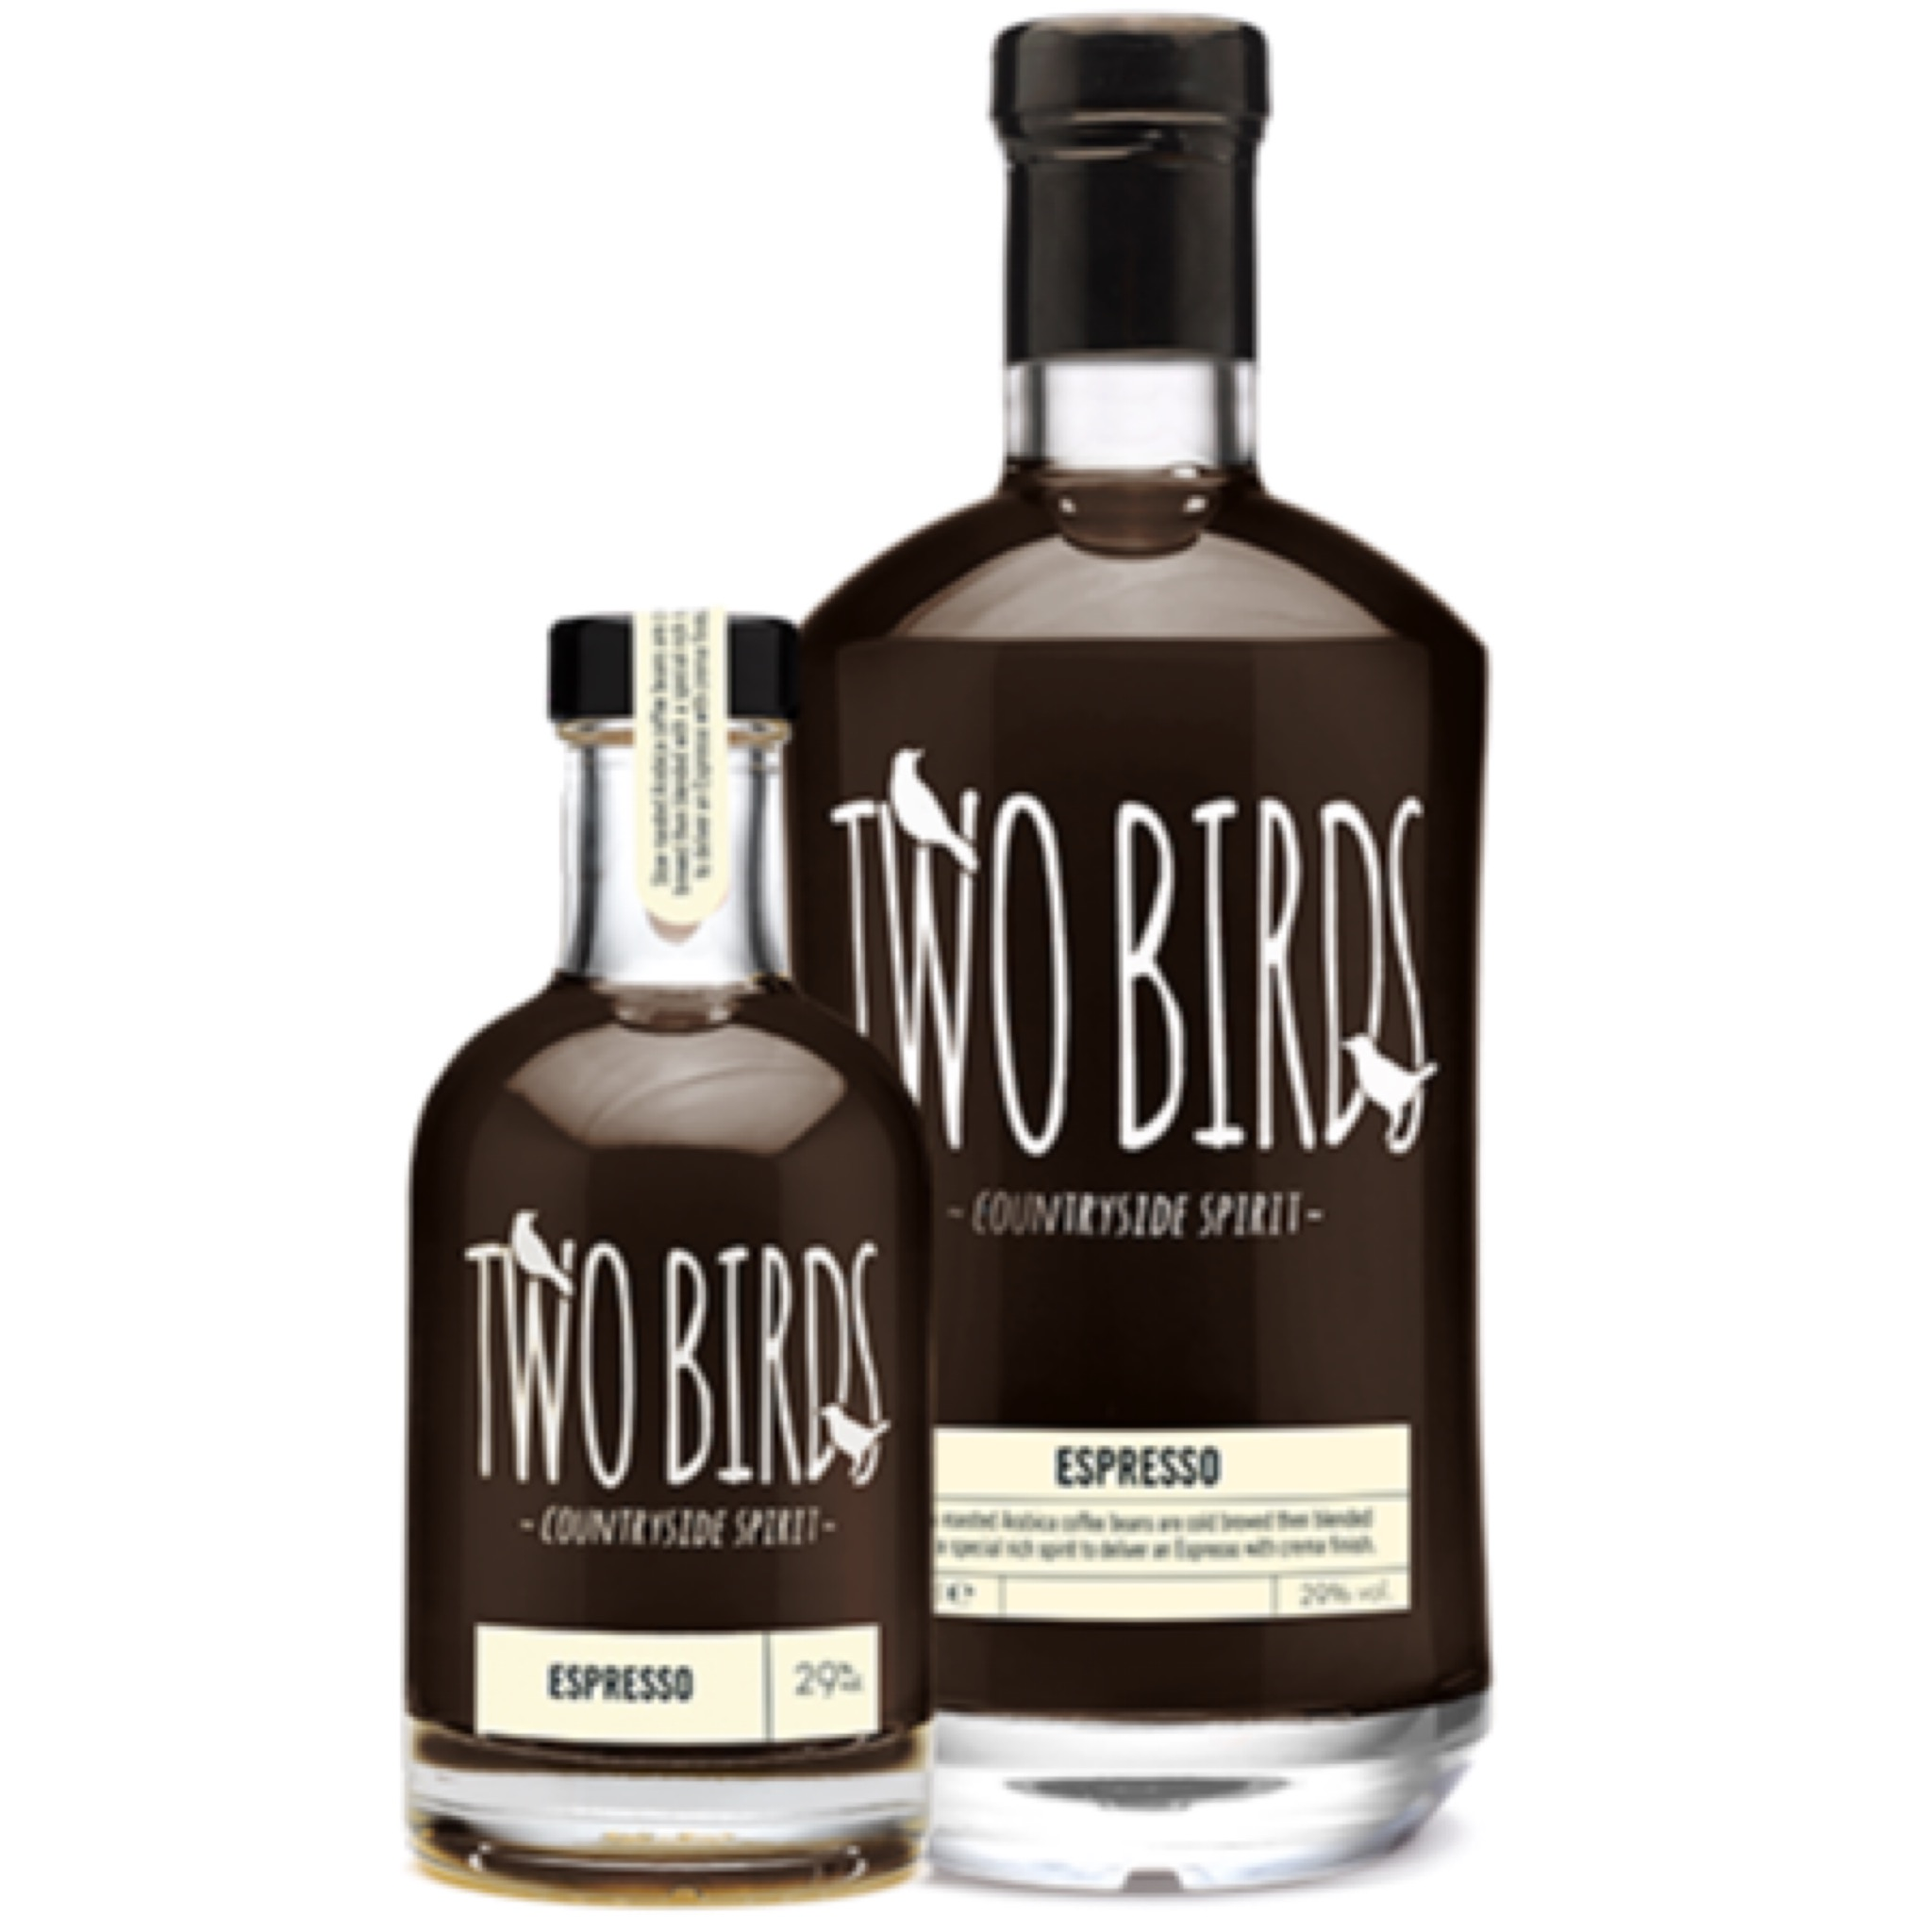 Two Birds Espresso Spirit 29% 200ml & 700ml